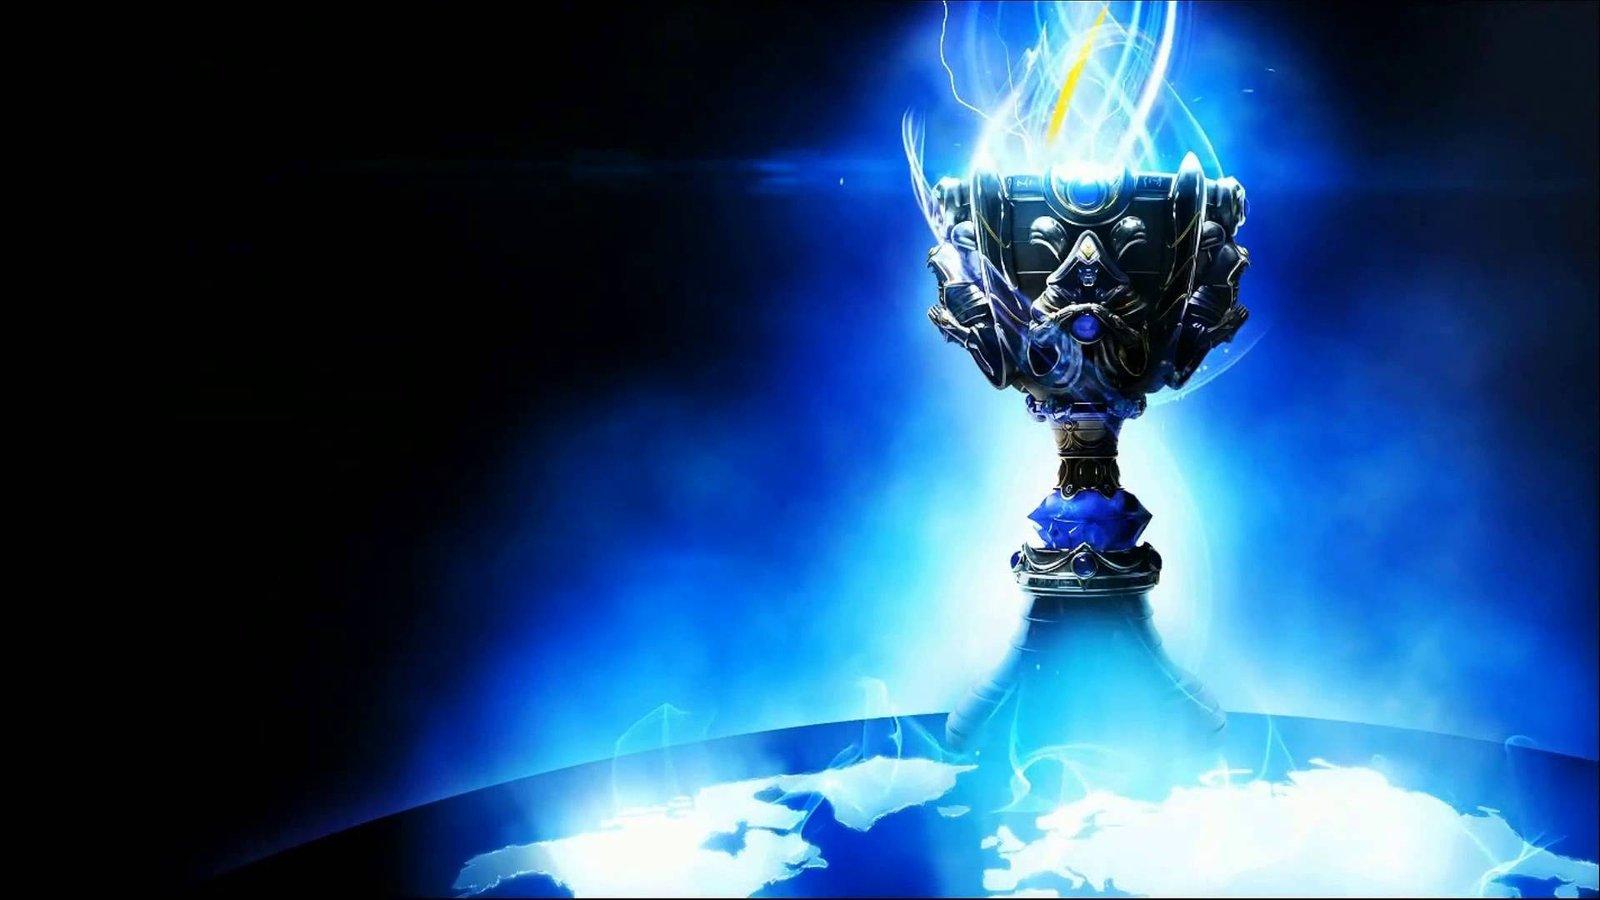 League Of Legends Champions Cup League Of Legends Wallpapers Art